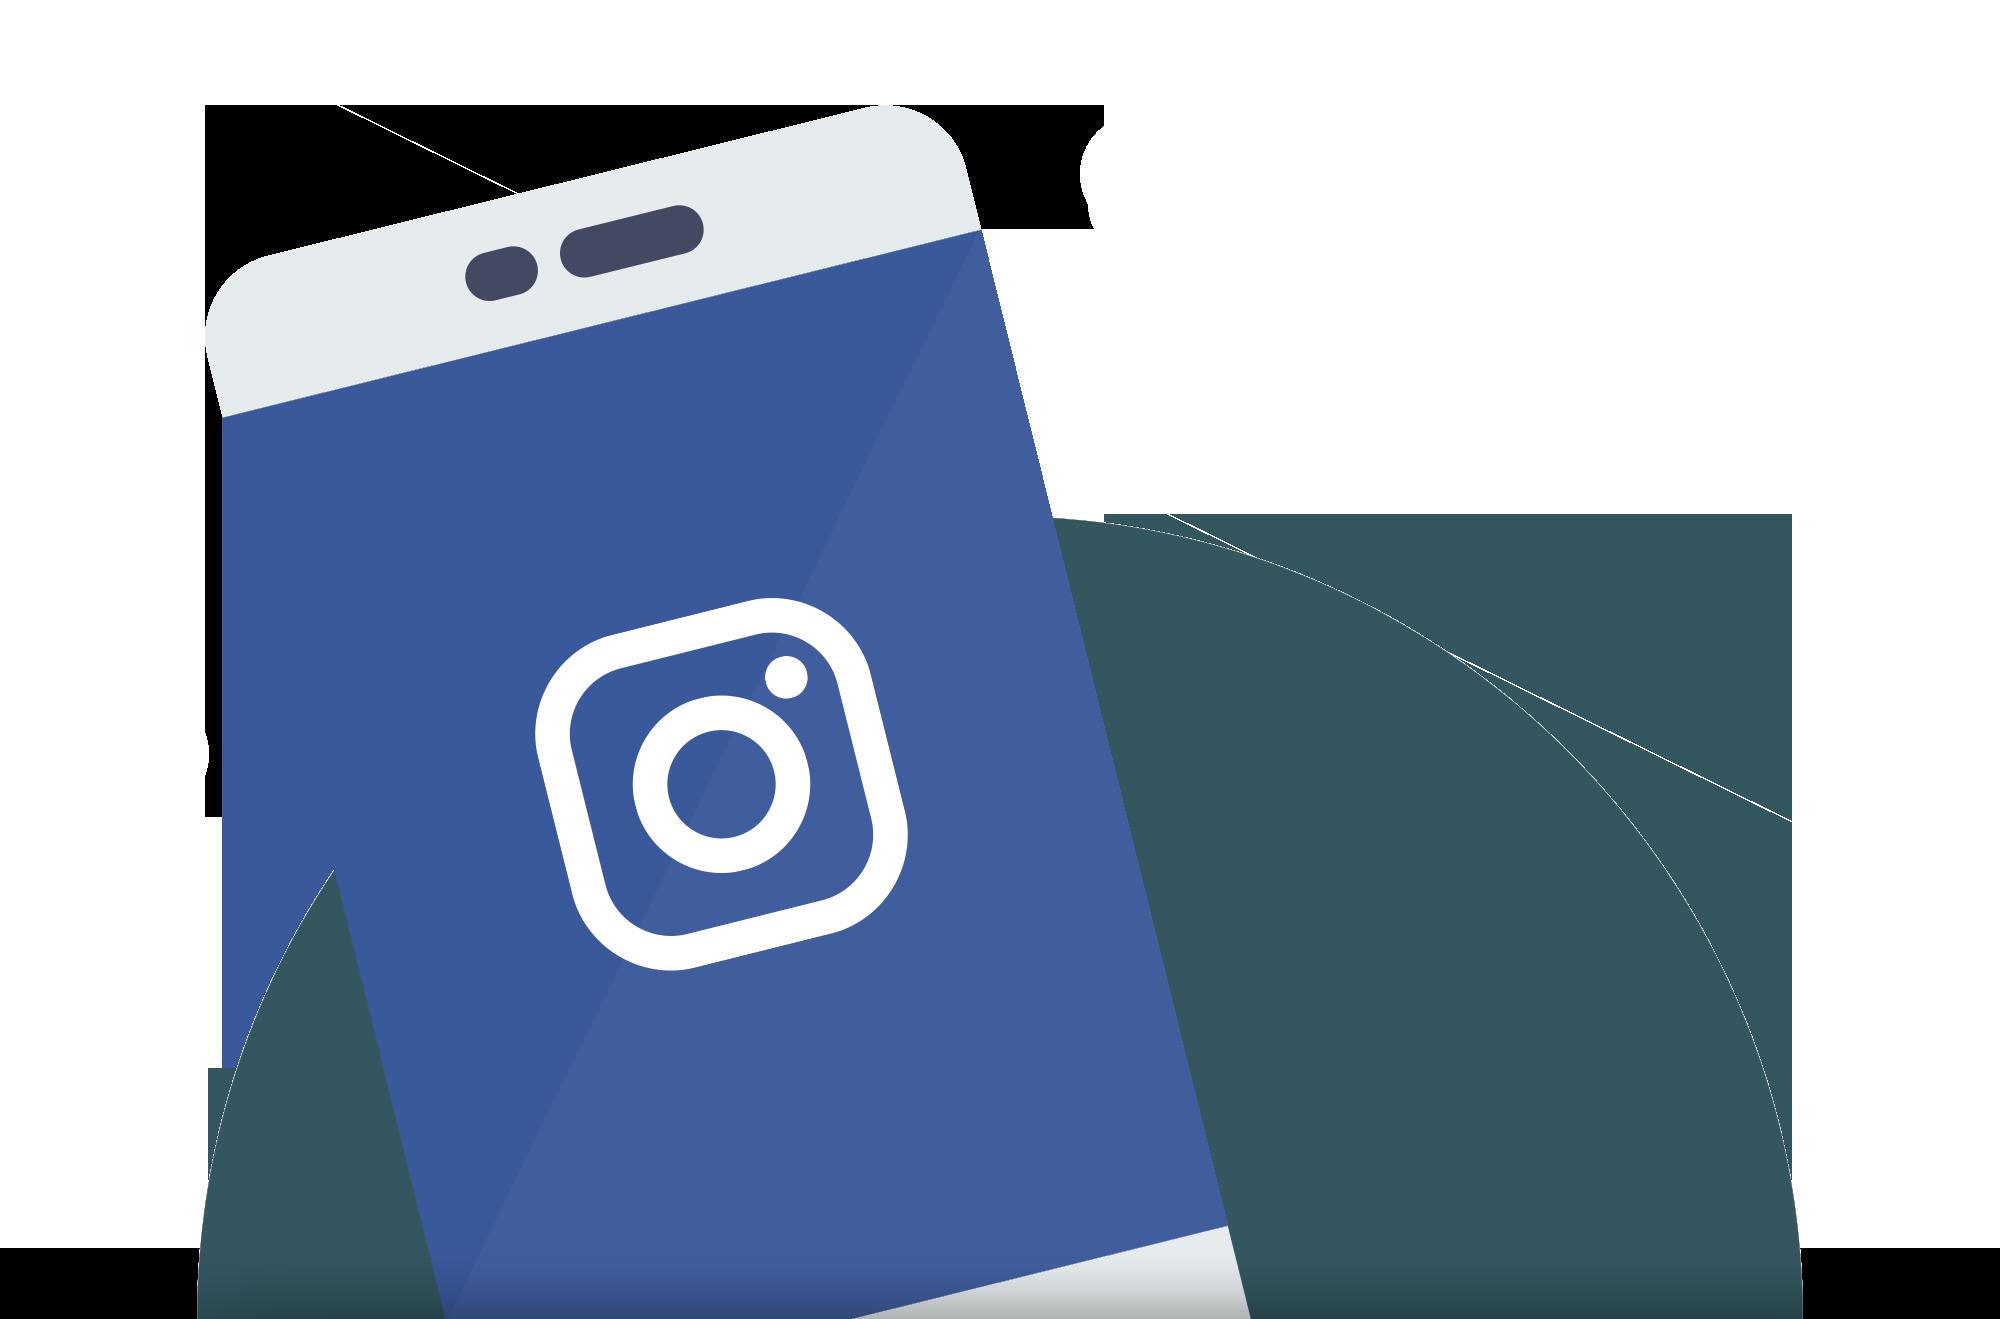 Sociale medier - Instagram annoncering